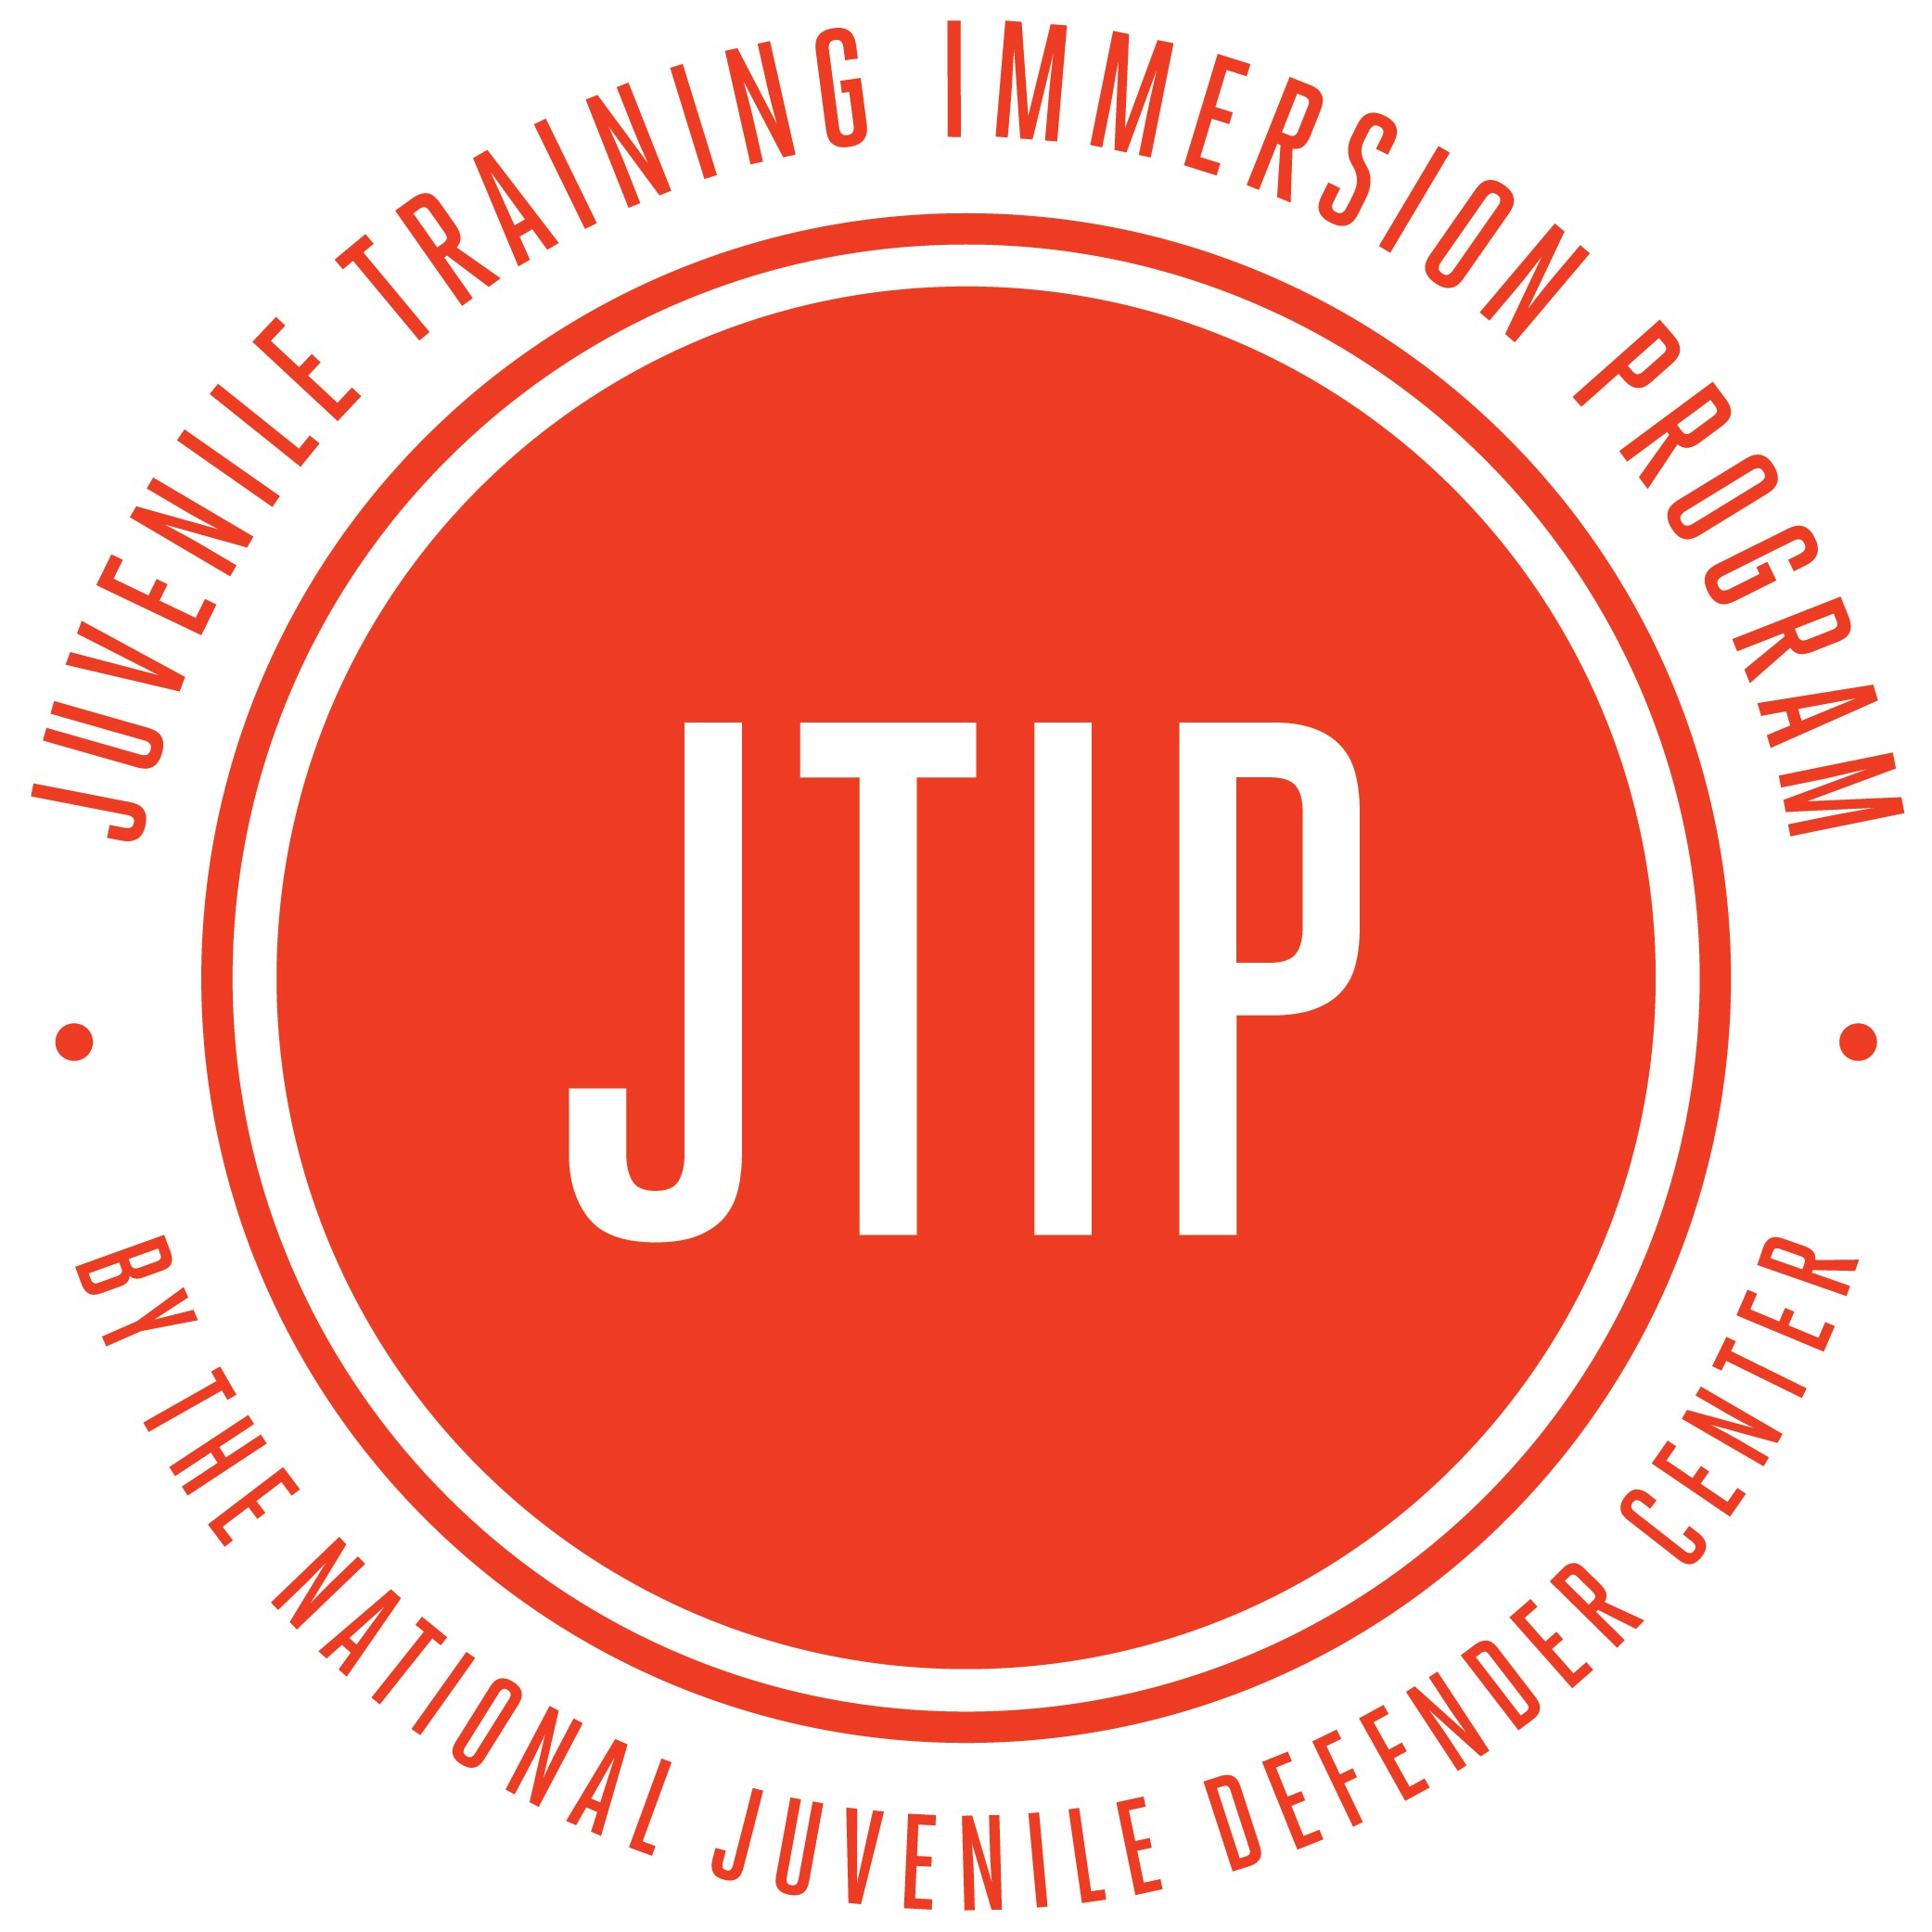 Juvenile Training Immersion Program (PDF Form)